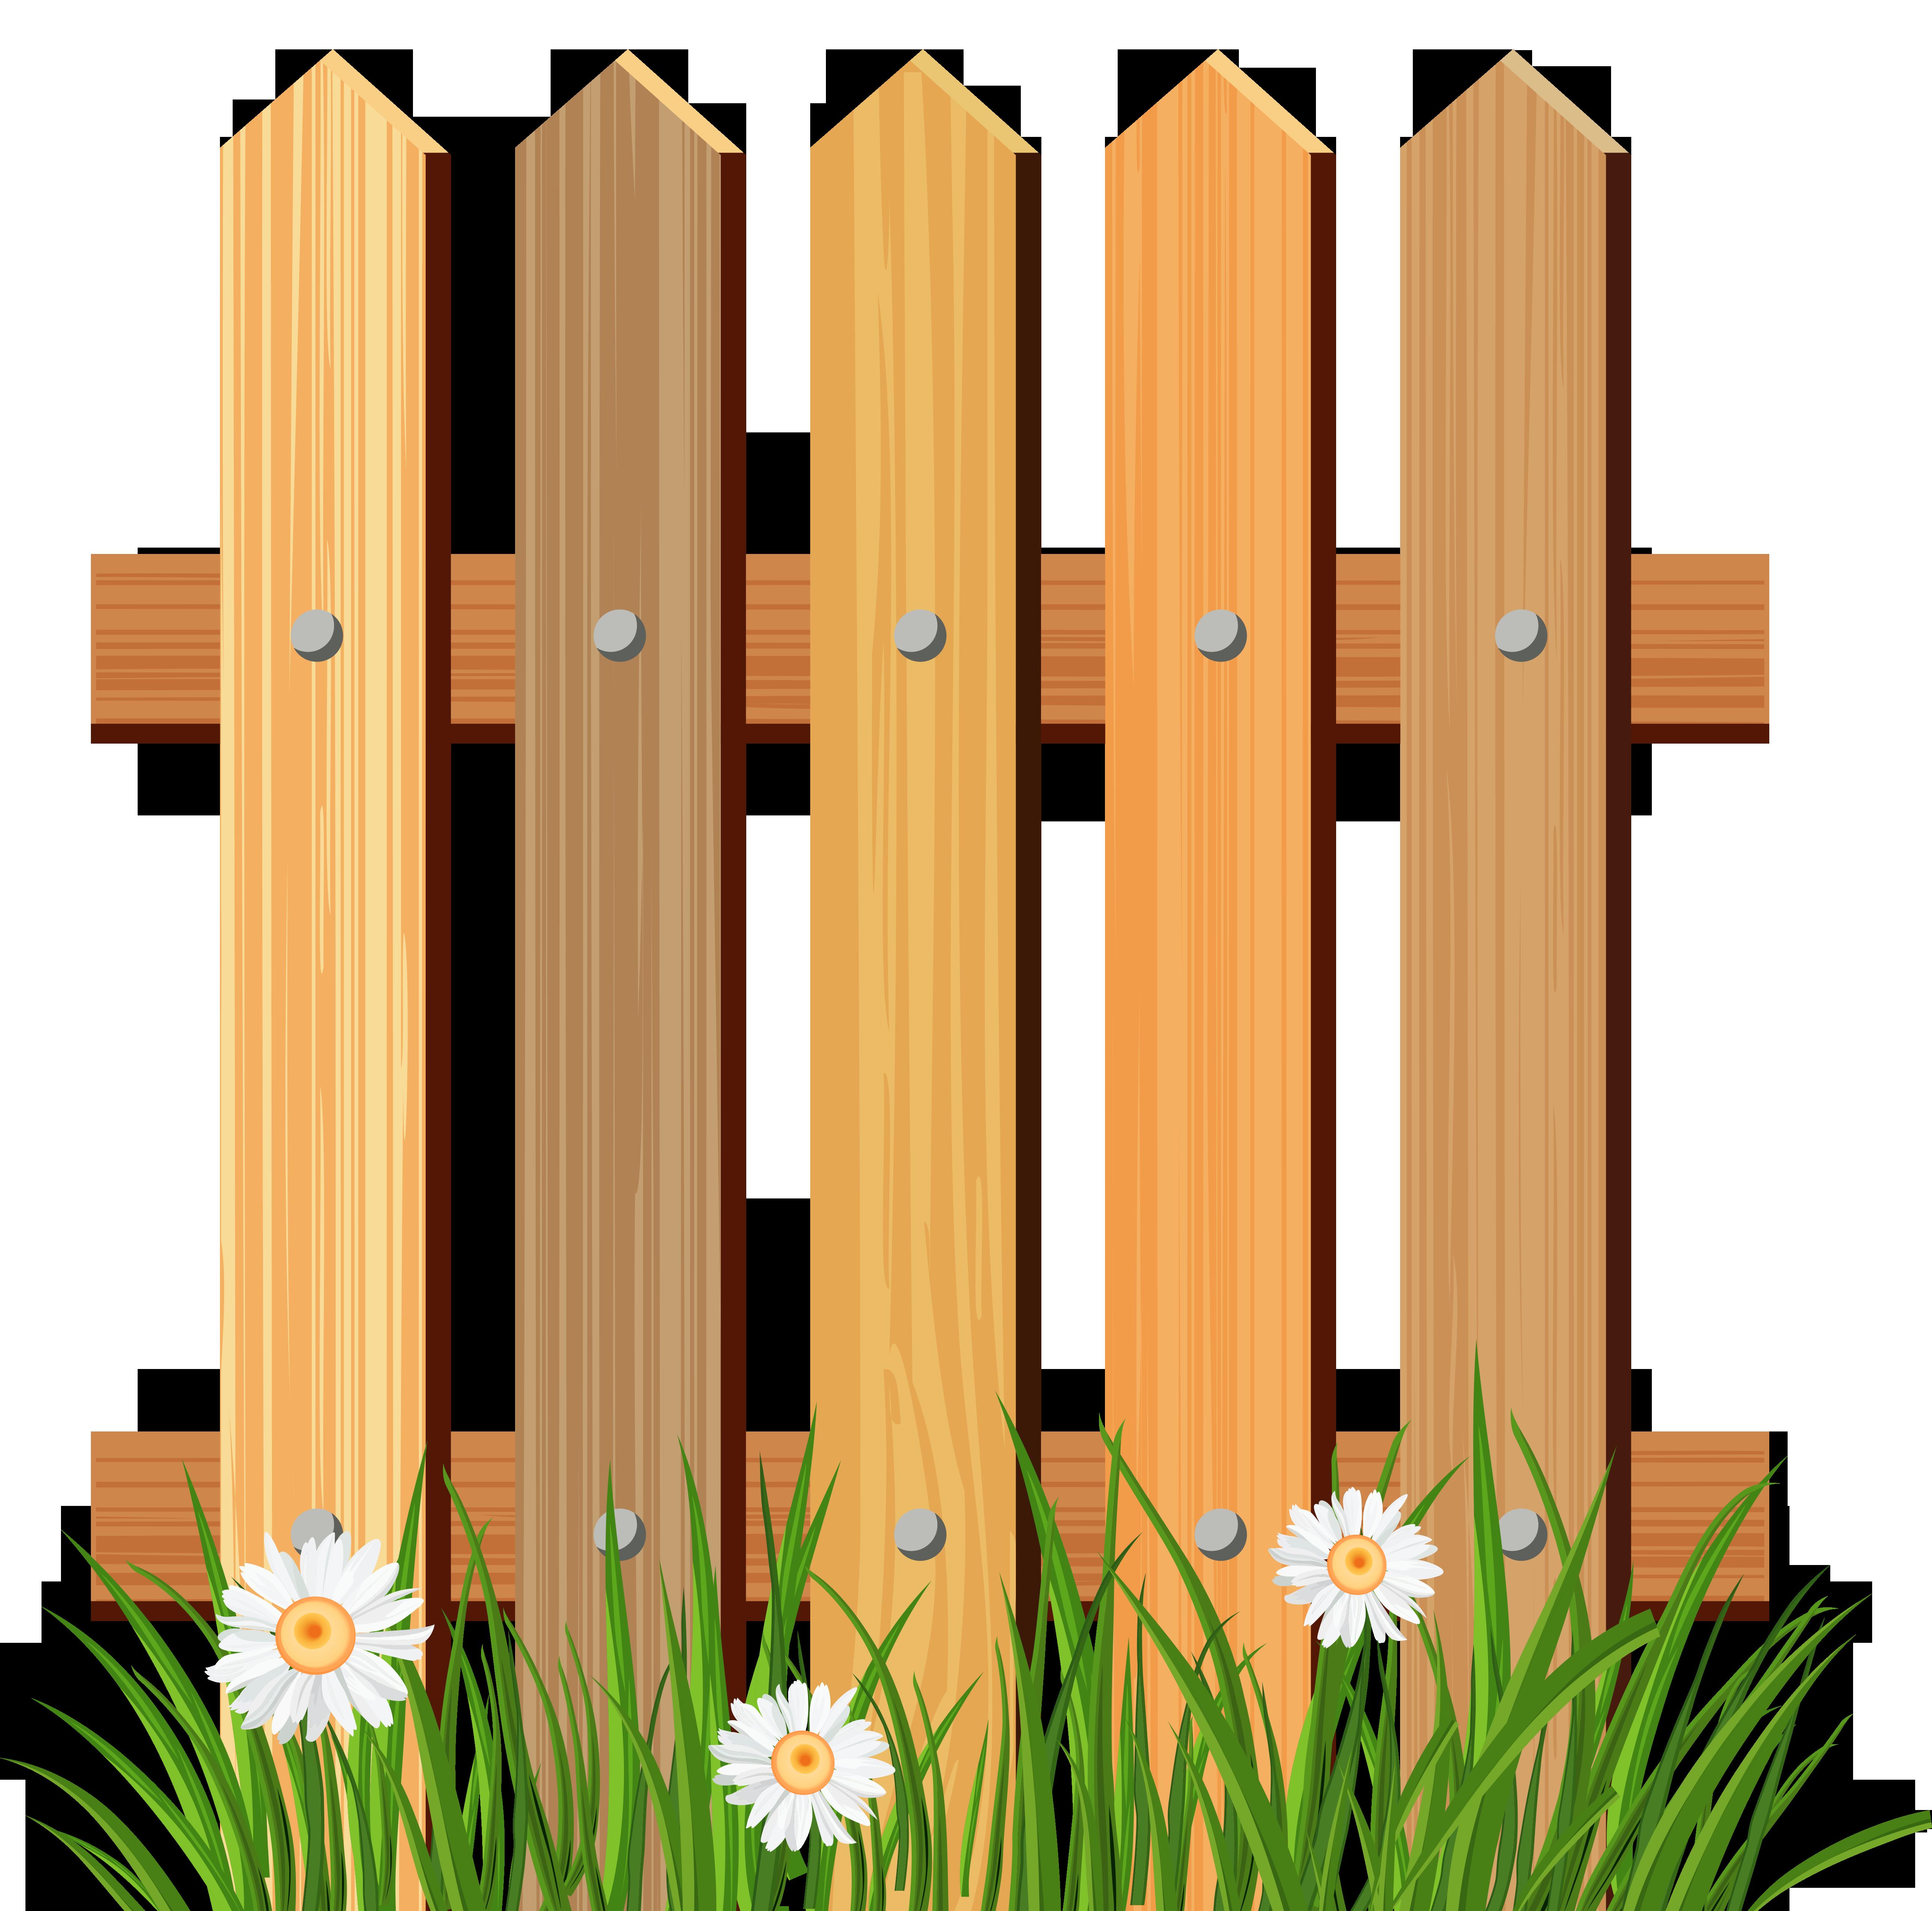 cartoon fence clipart festa pequeno principe pinterest fences rh pinterest com fence clip art free fence clipart png